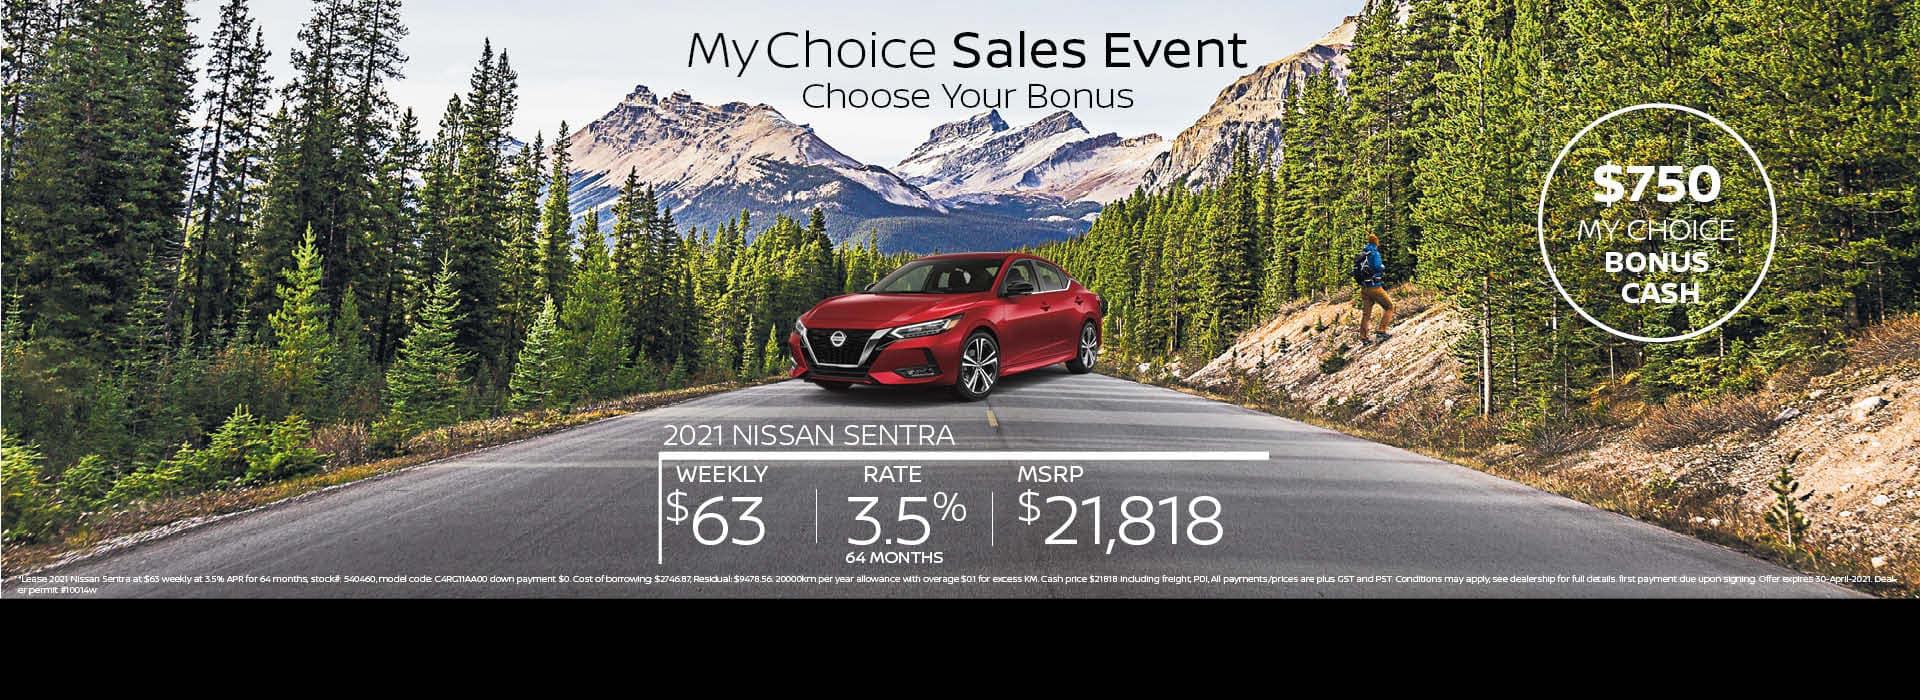 2021_Nissan_Sentra_Desktop_April2021